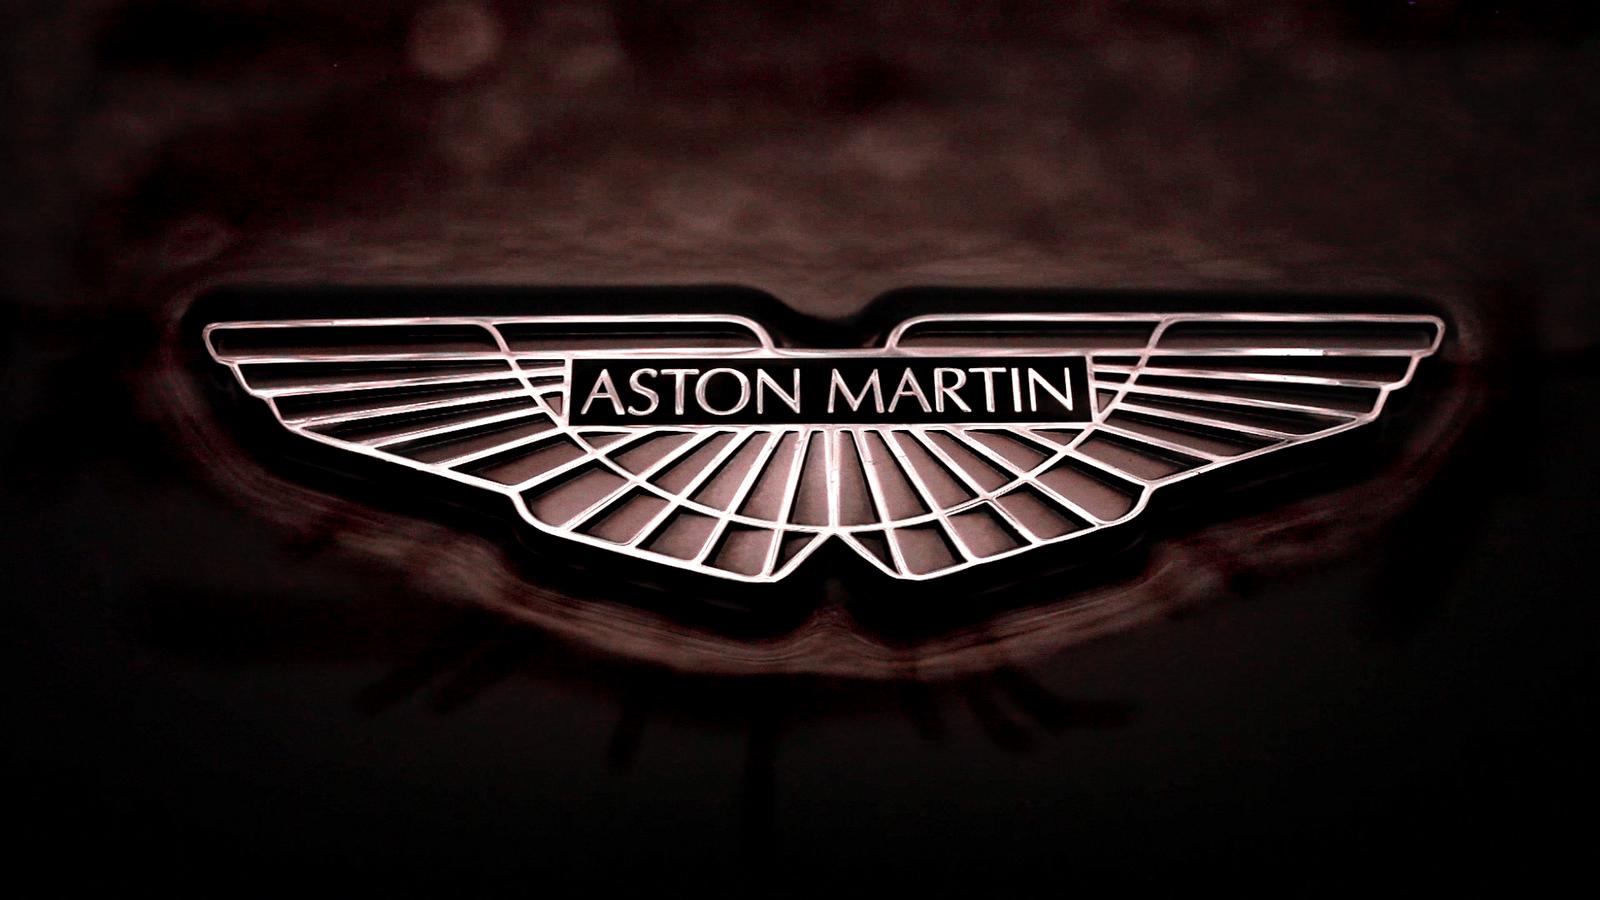 aston martin logo wallpapers - wallpaper cave